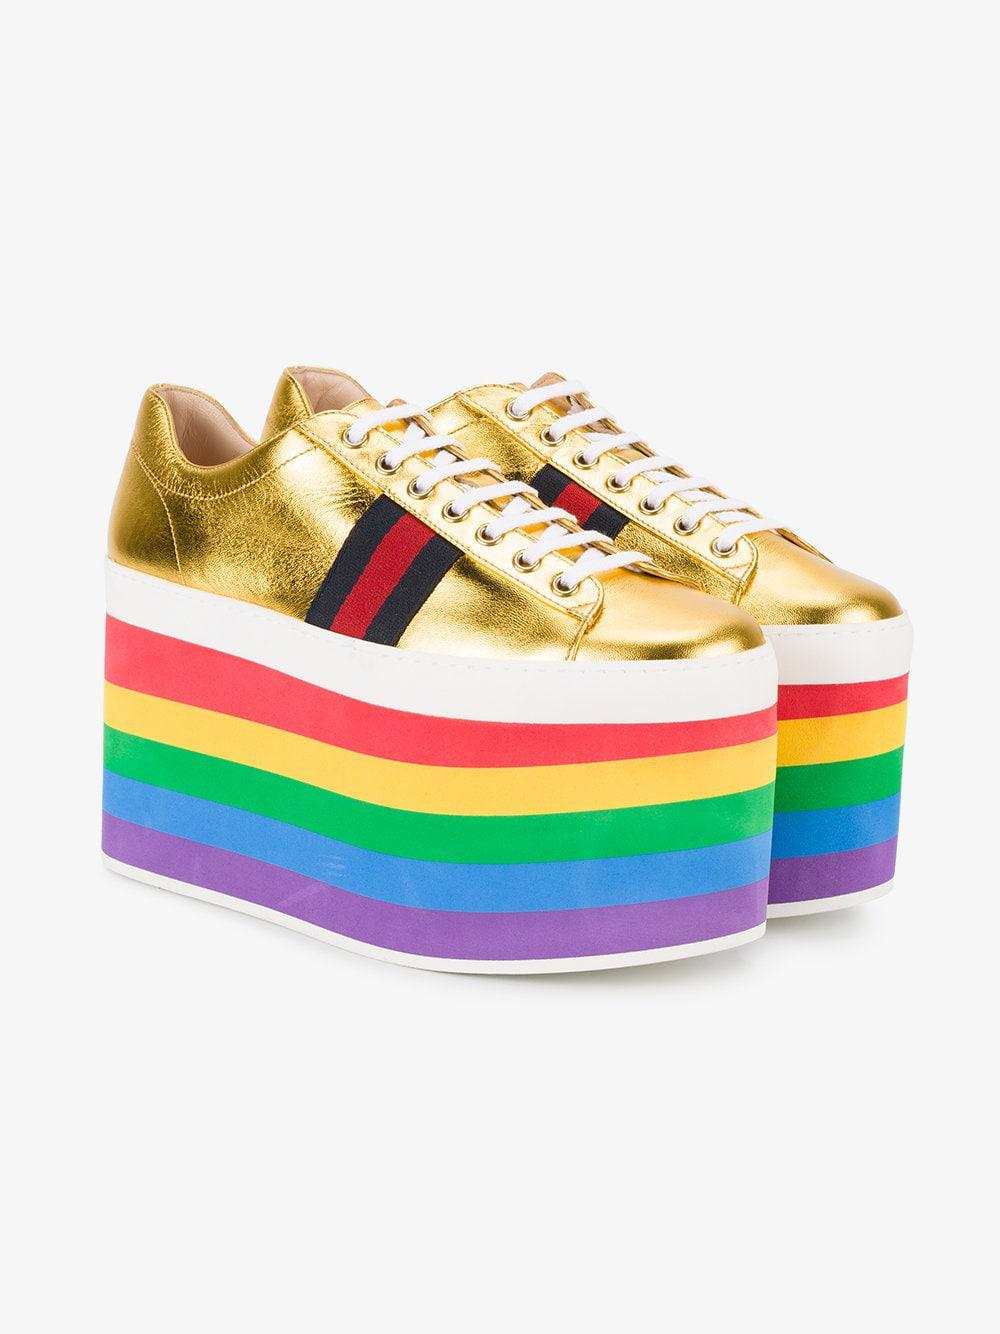 Gucci Peggy Rainbow Platform Leather